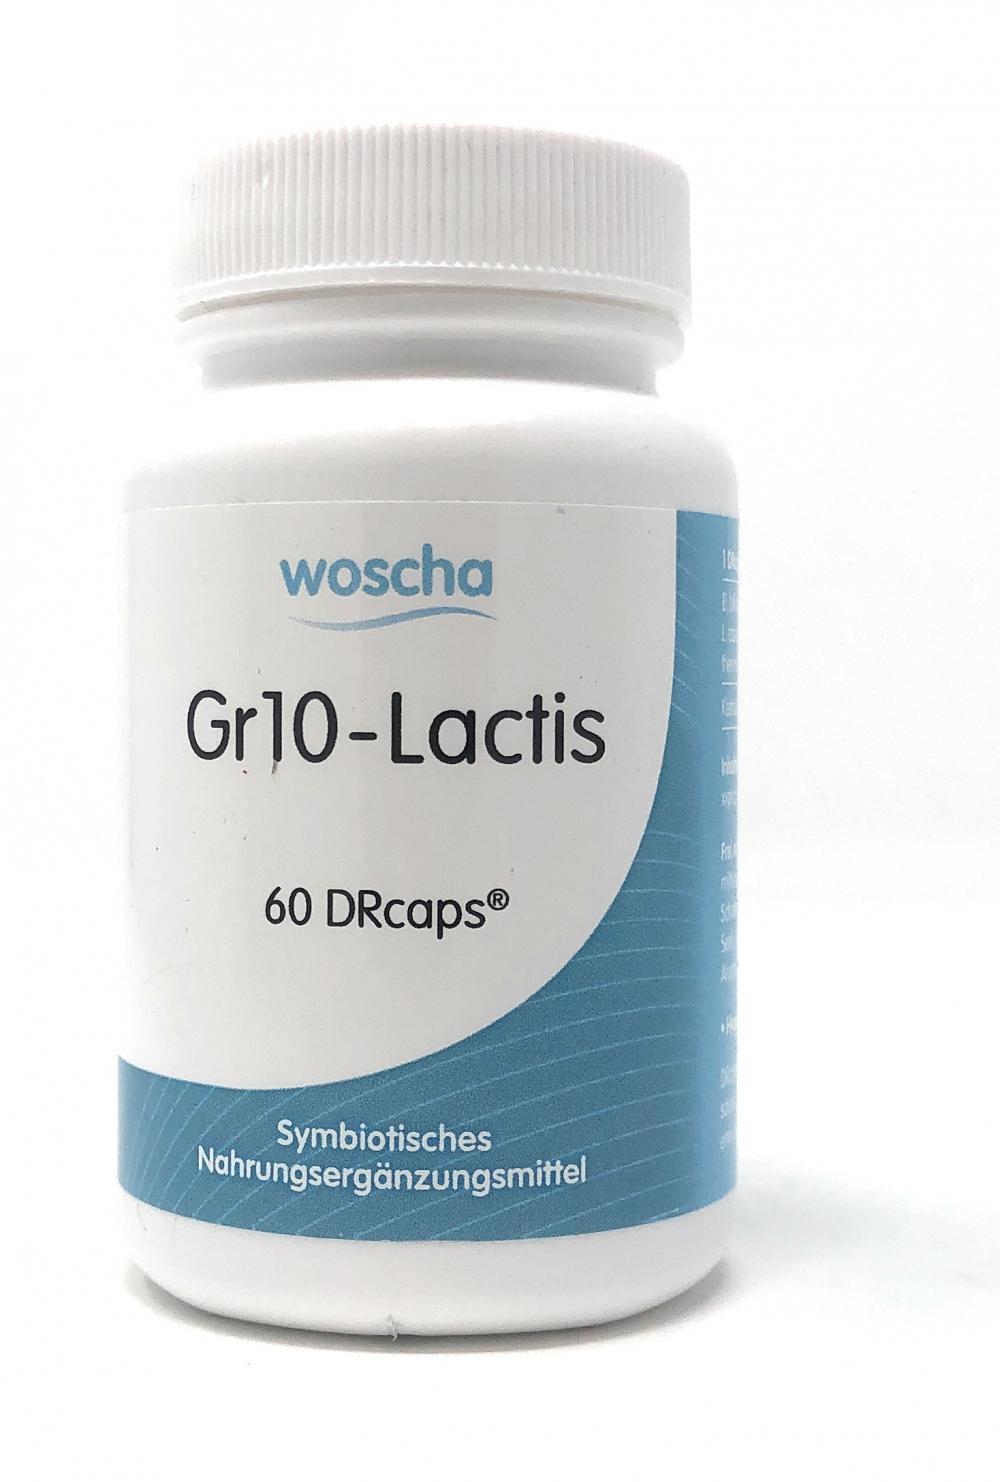 woscha GR10-Lactis 60 DRcaps (32g)(vegan)